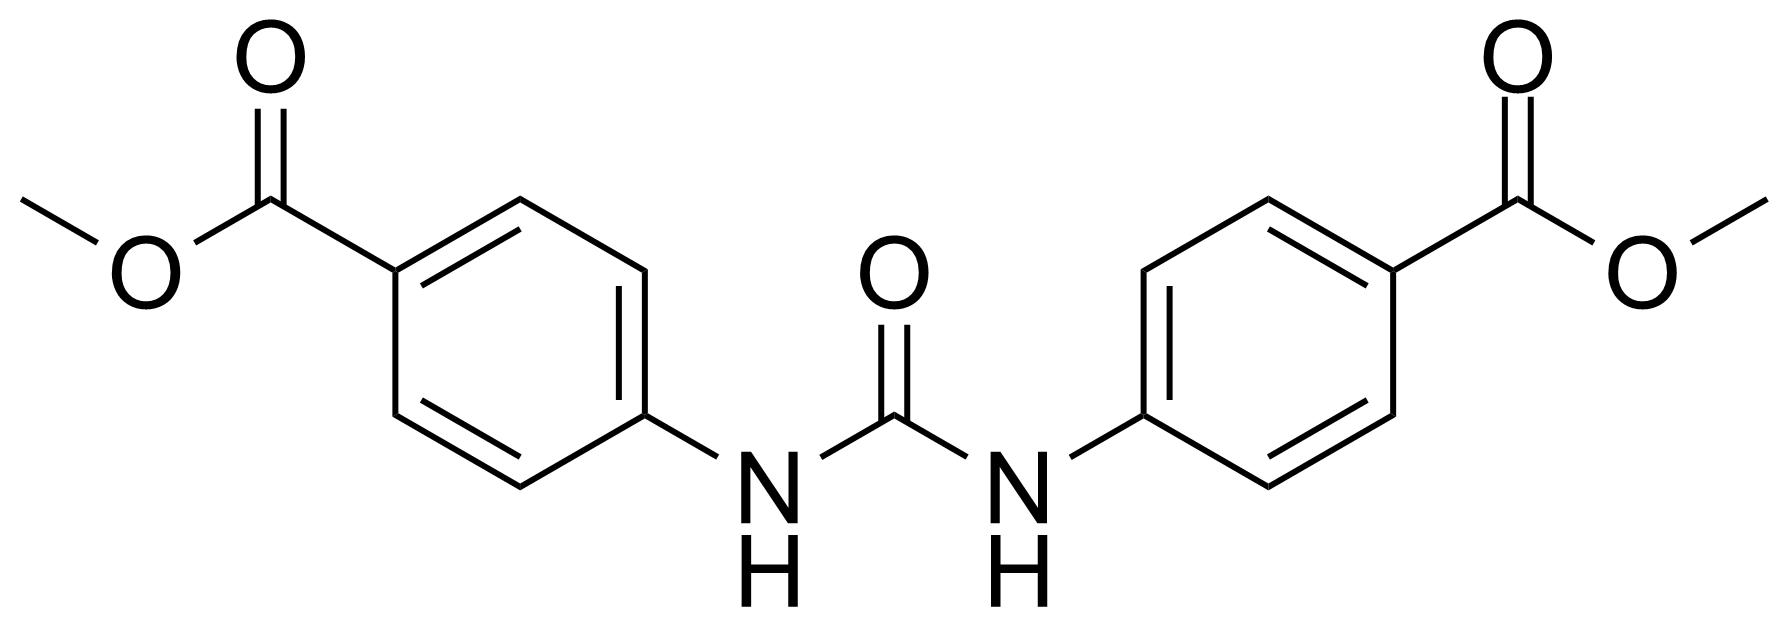 Structure of Methyl 4-[(4-methoxycarbonylphenyl)carbamoylamino]benzoate